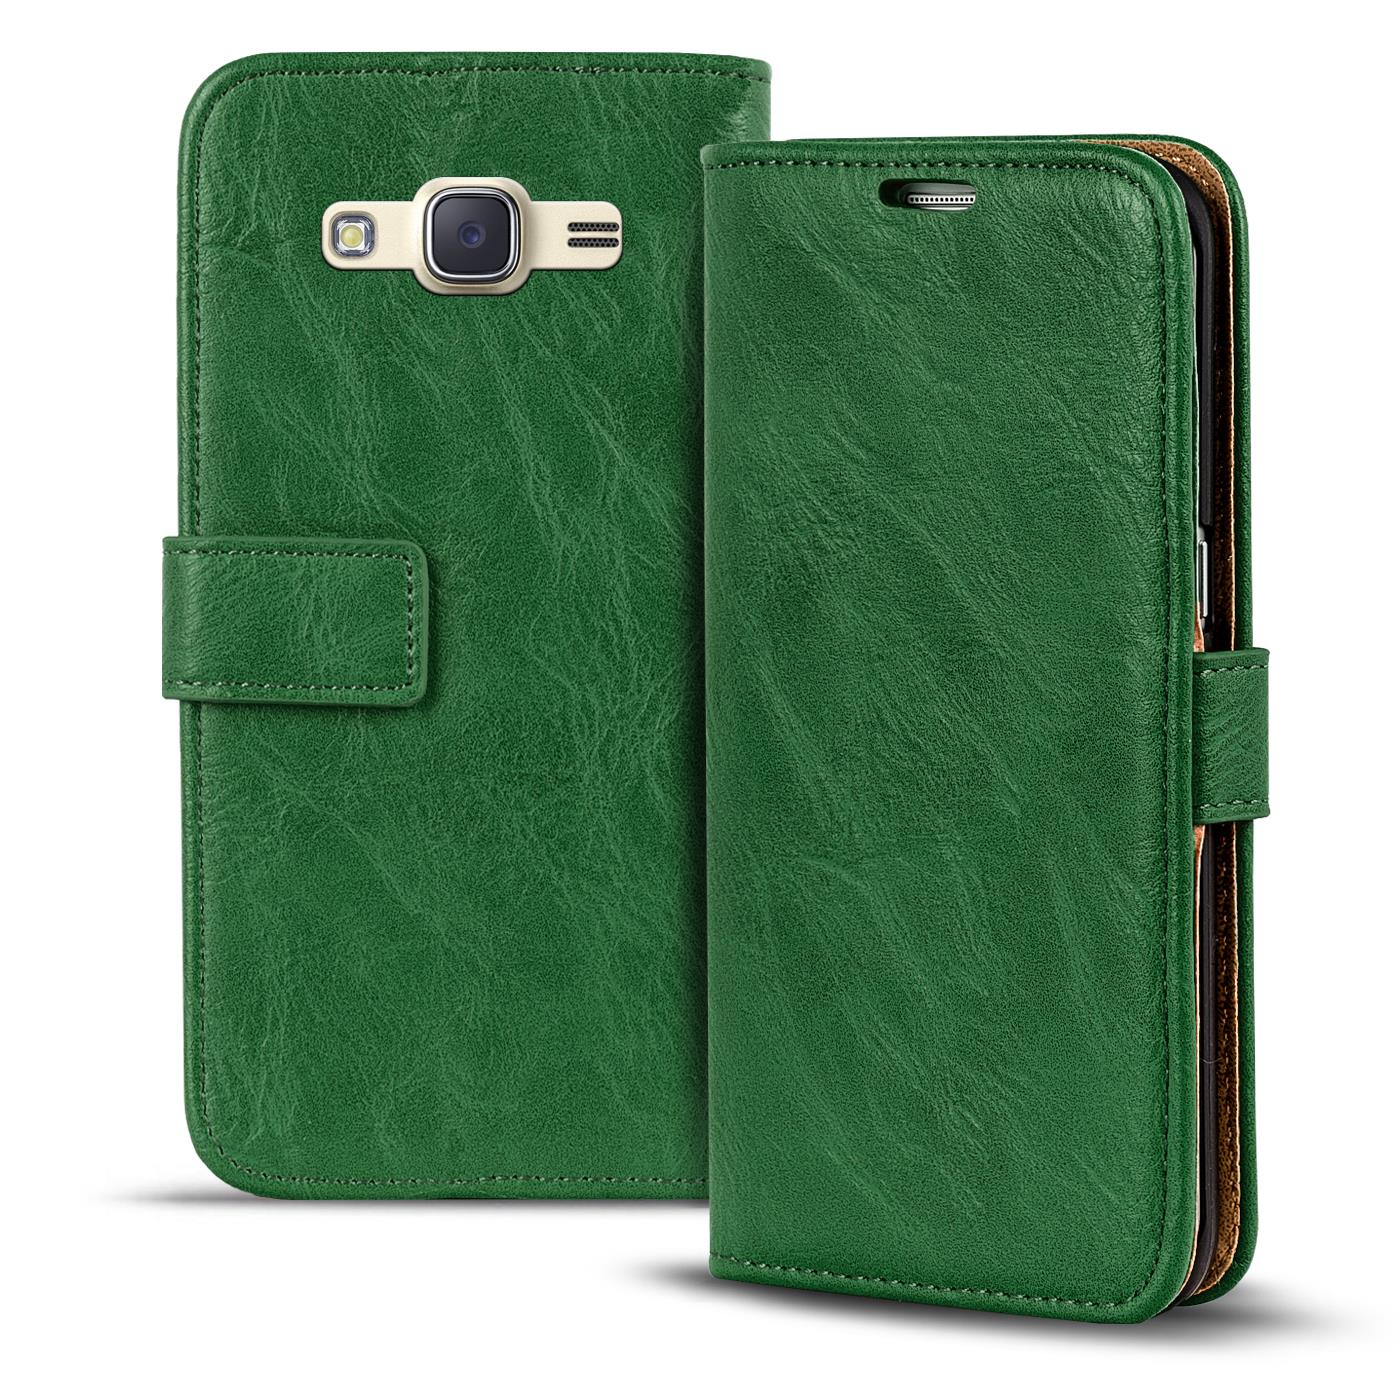 Handy-Tasche-Huelle-Samsung-Galaxy-J1-2016-Case-Klapphuelle-PU-Leder-Wallet-Cover